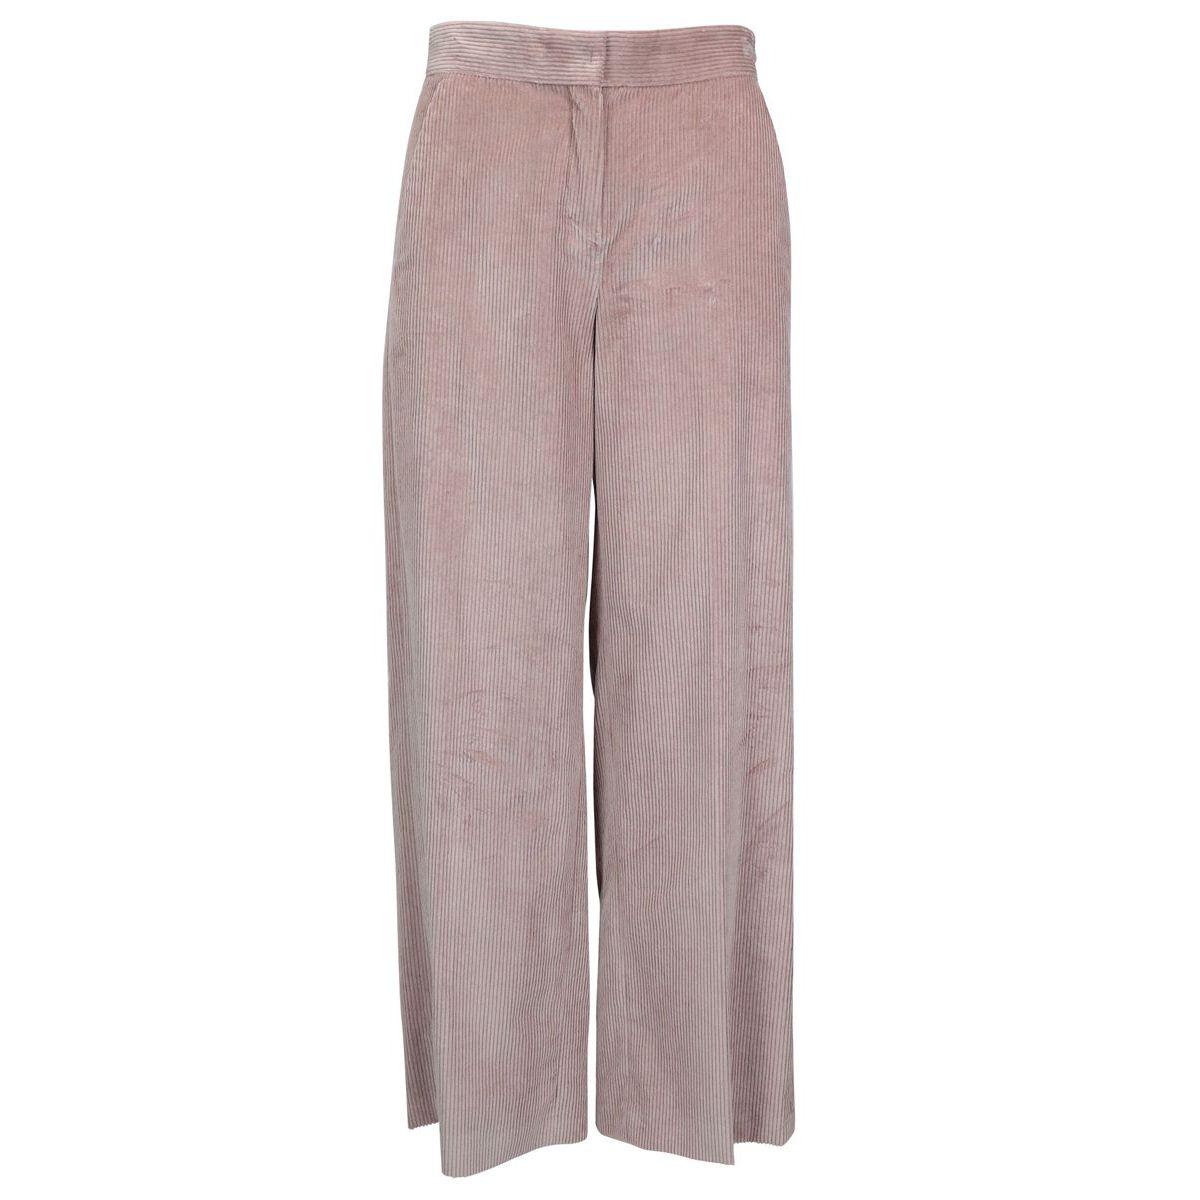 Cropped corduroy trousers STIRIA Powder pink Max Mara